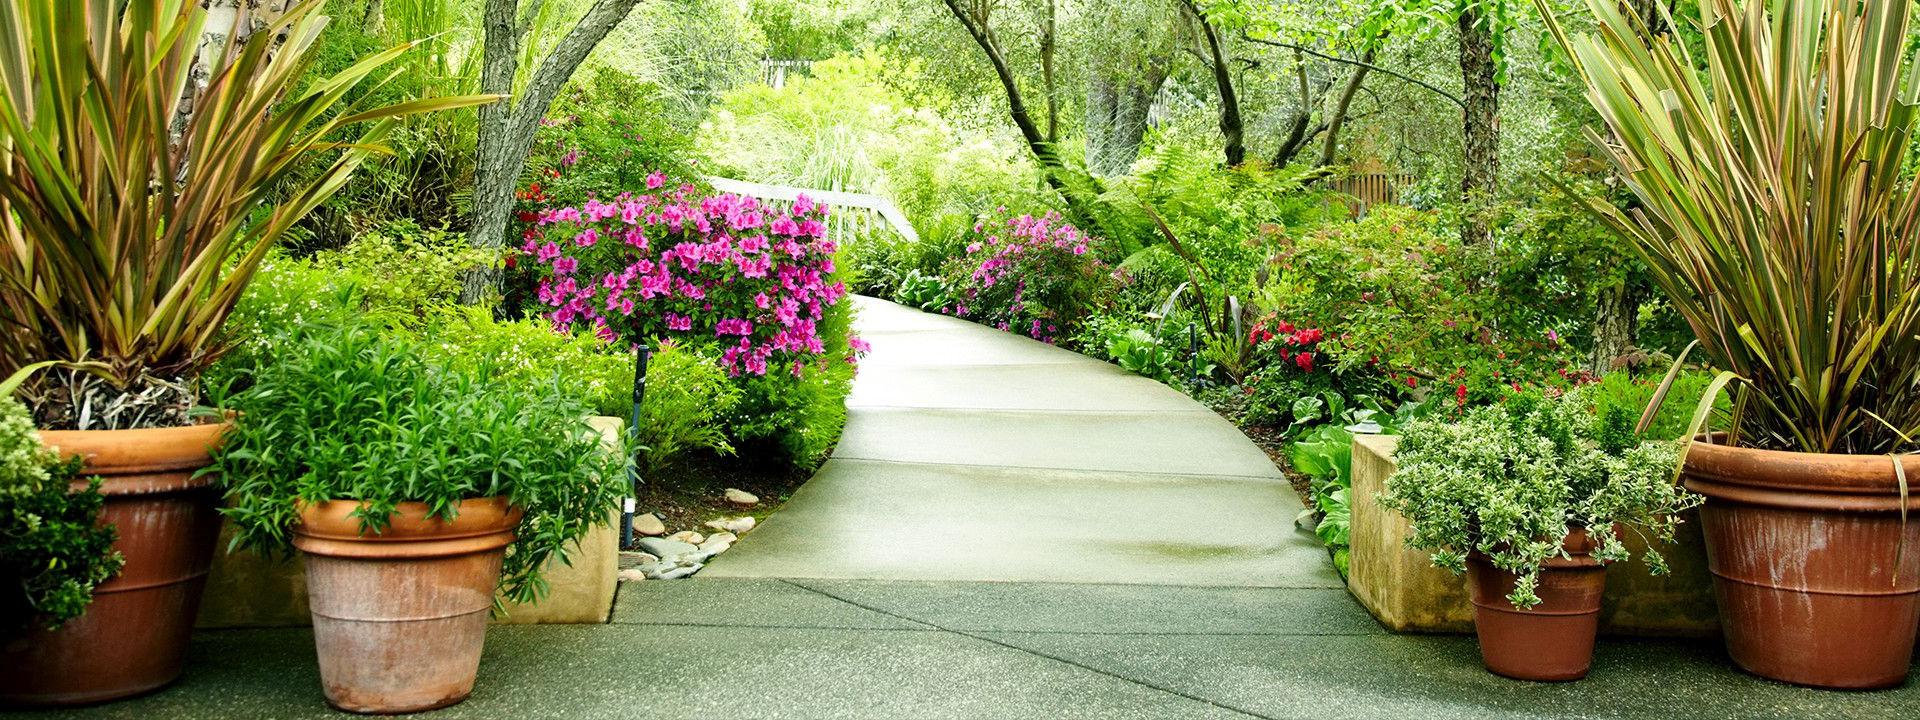 Resources | Bissler & Sons Funeral Home